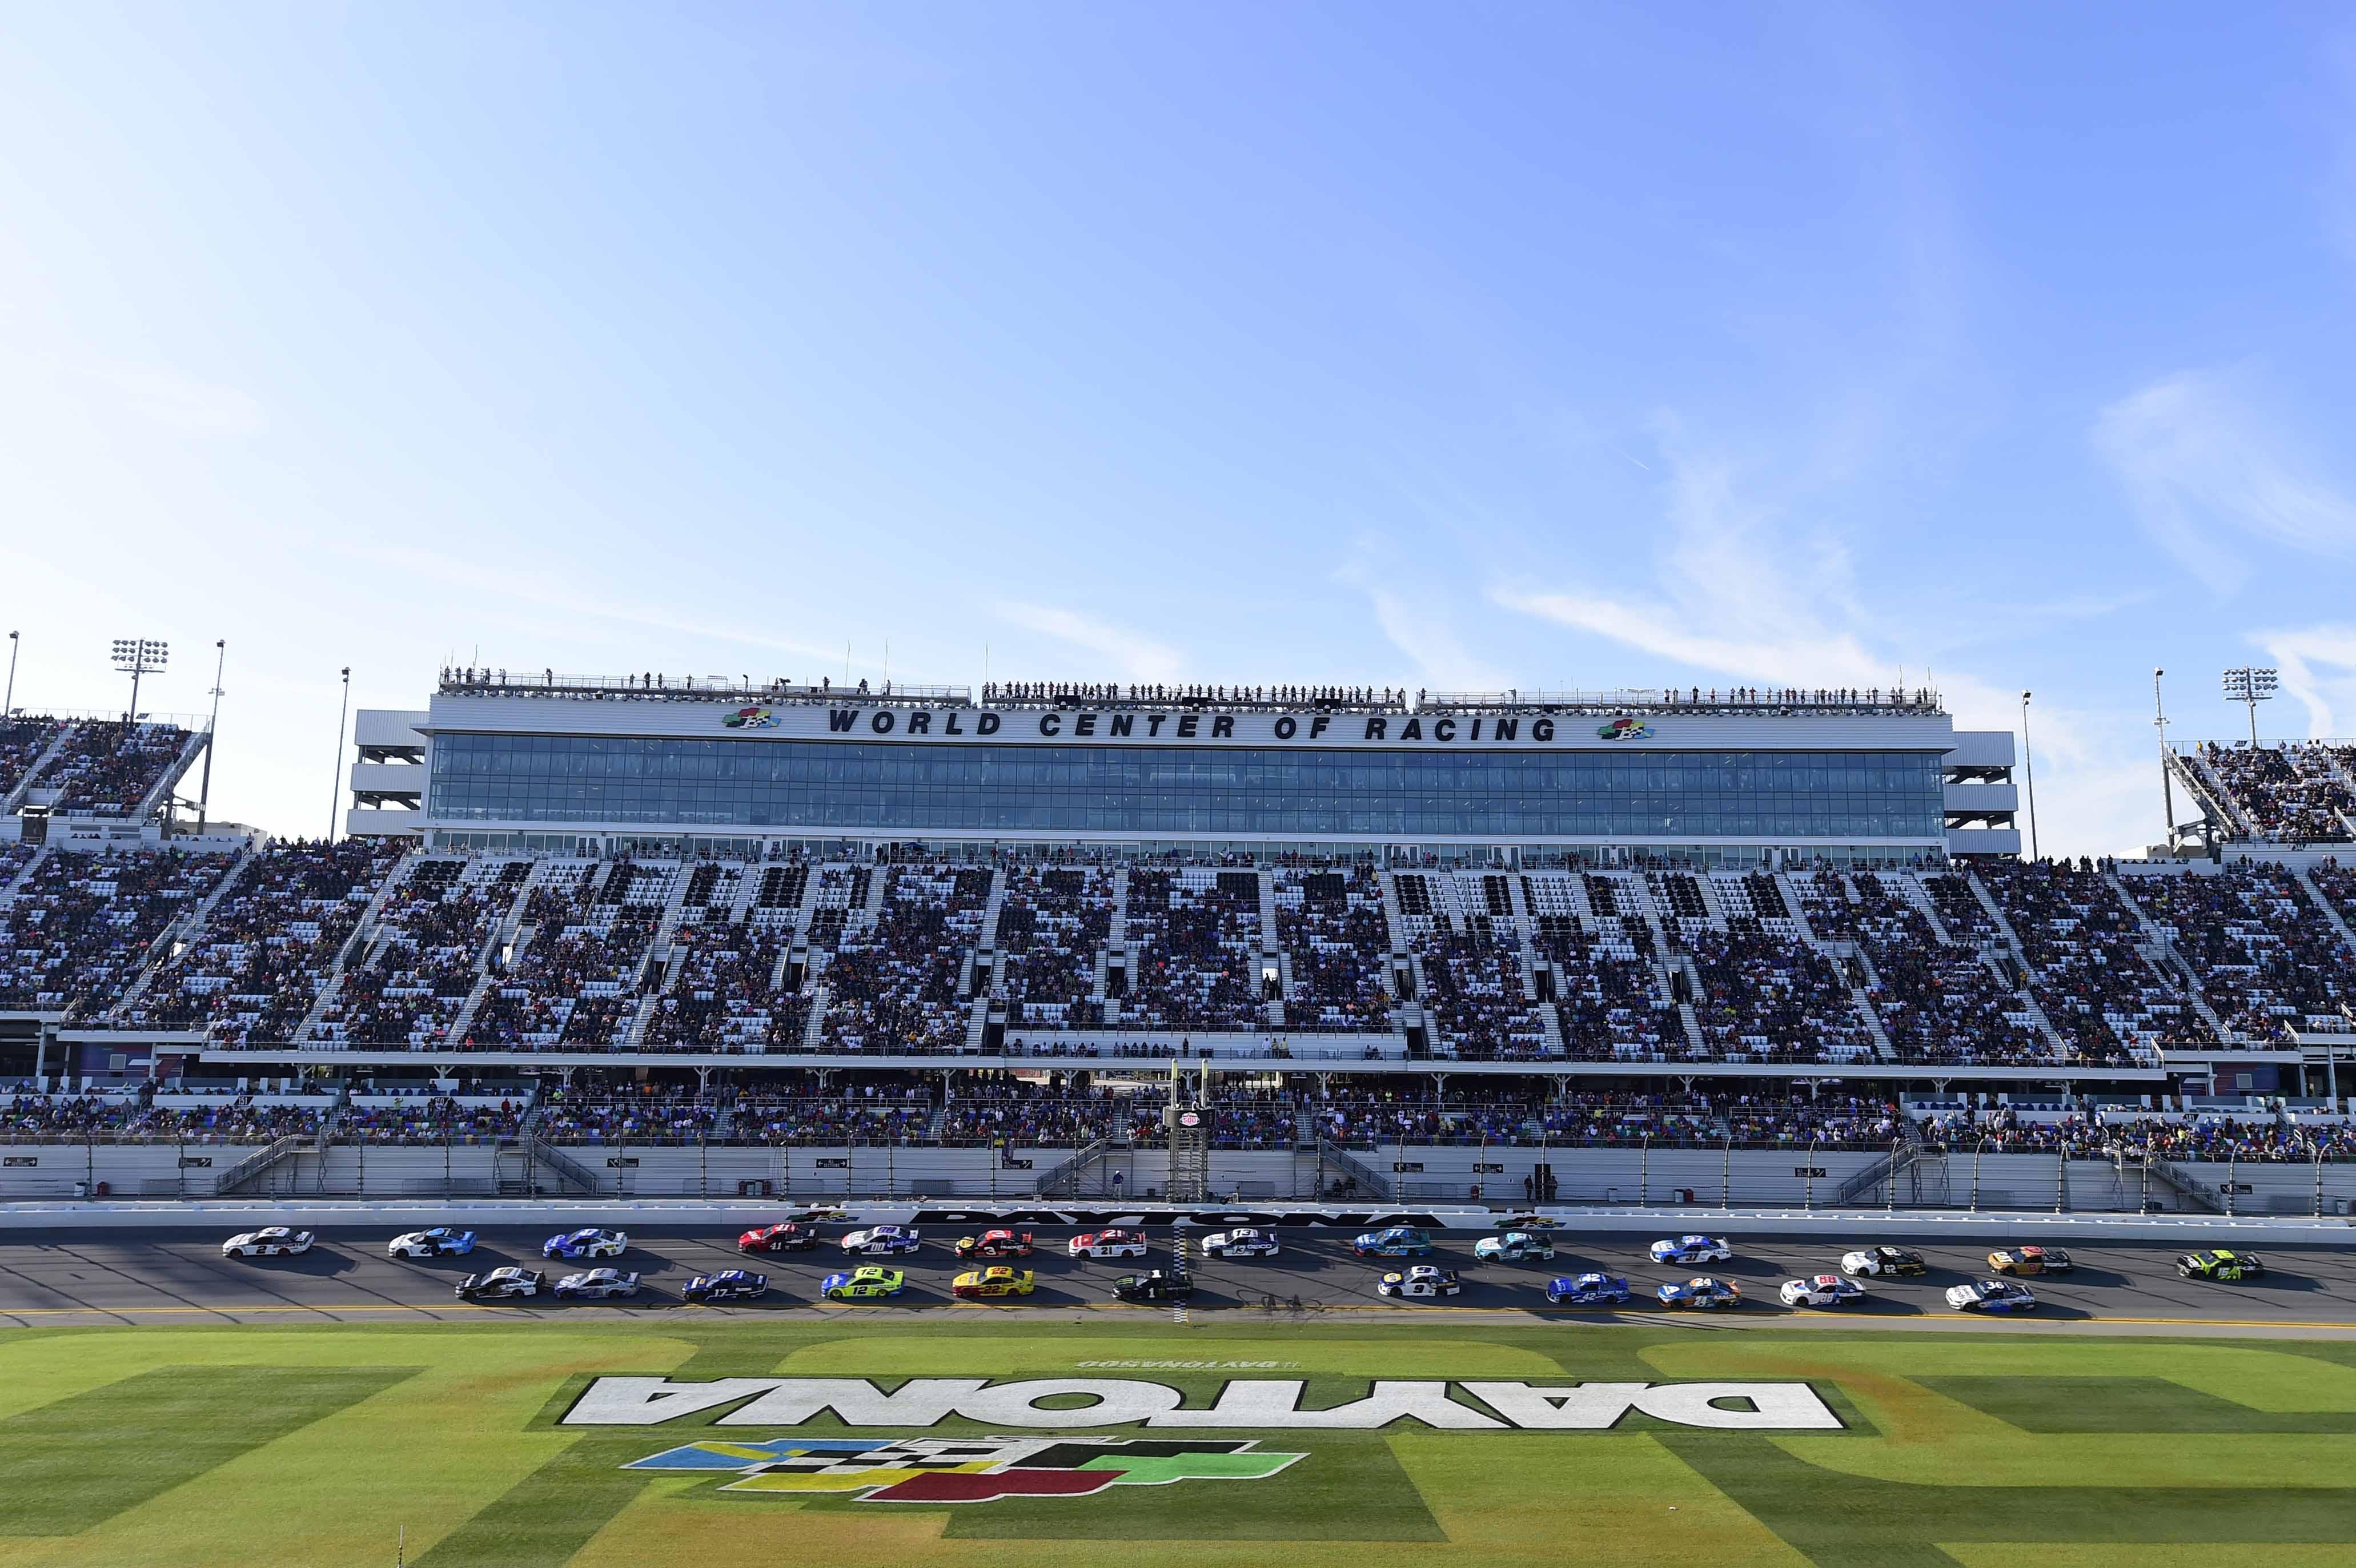 Daytona International Speedway - World Center of Racing - NASCAR Cup Series - Daytona 500